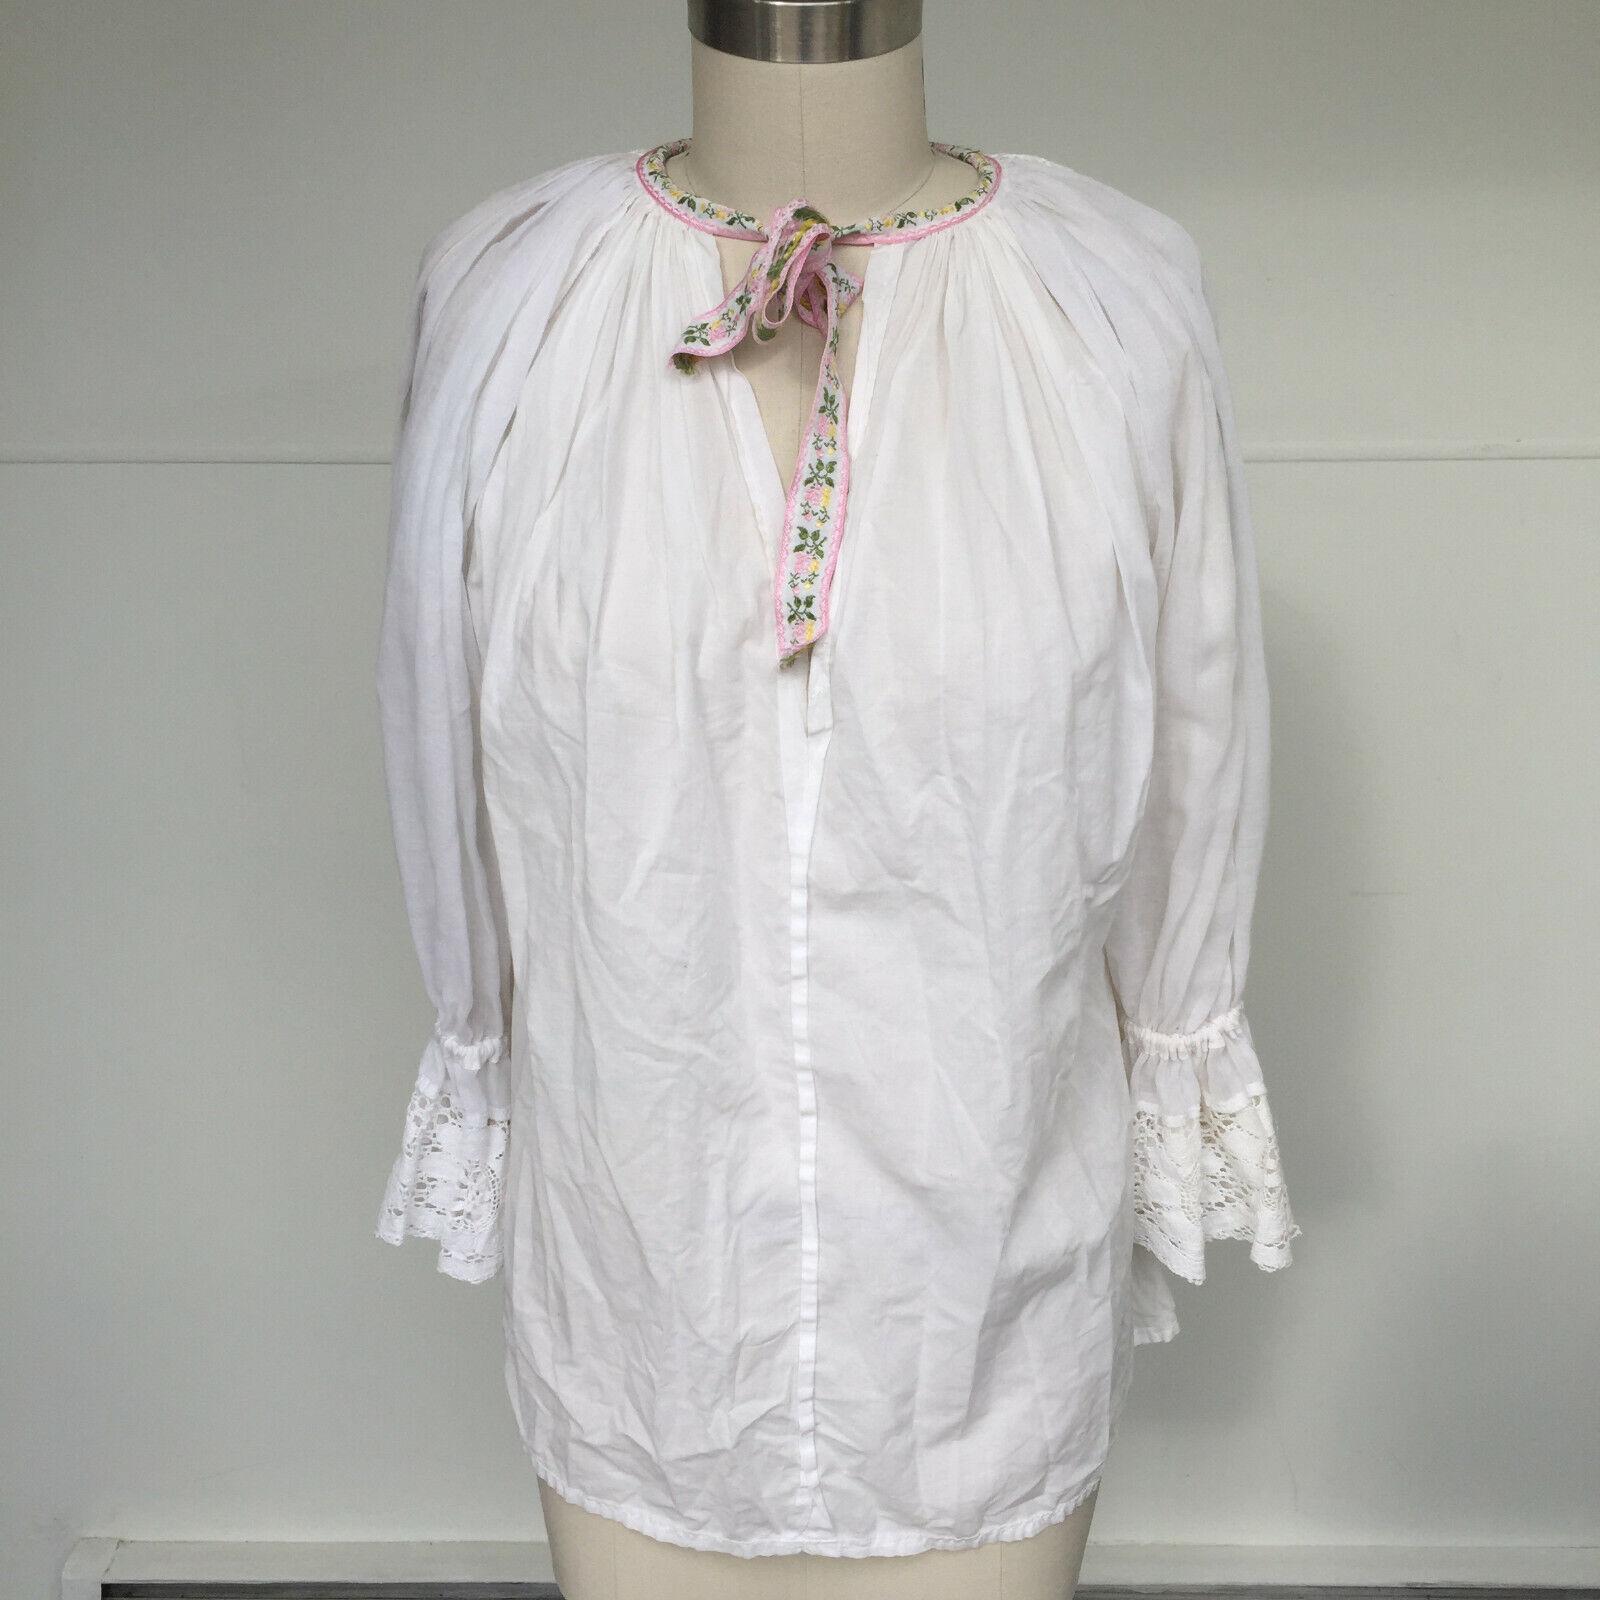 VTG 1970s Hungarian Handmade Textured Boho-Chic P… - image 1